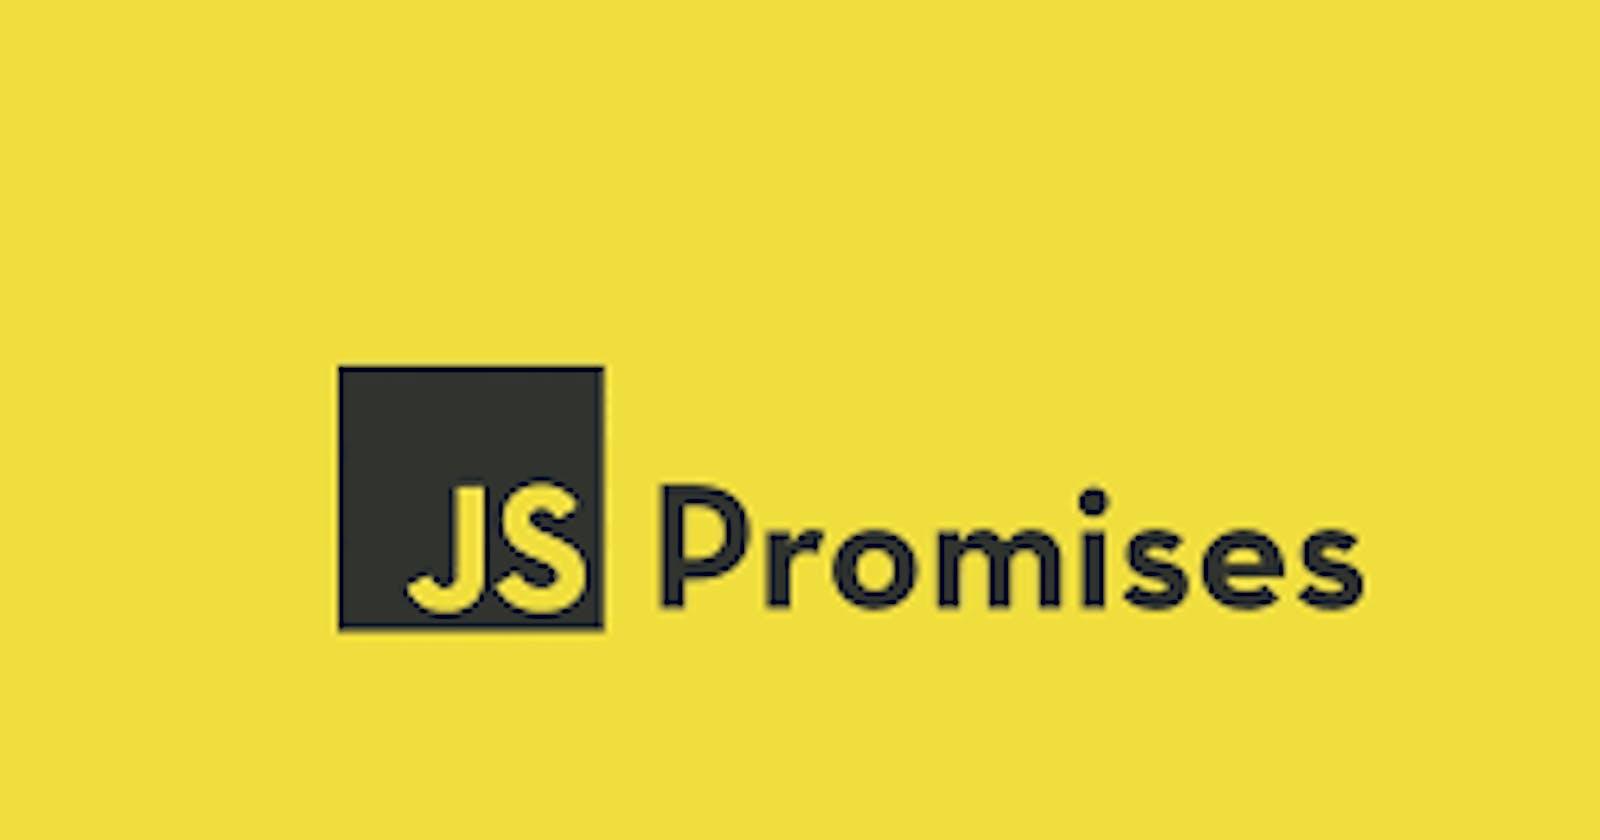 Making Promises in JavaScript